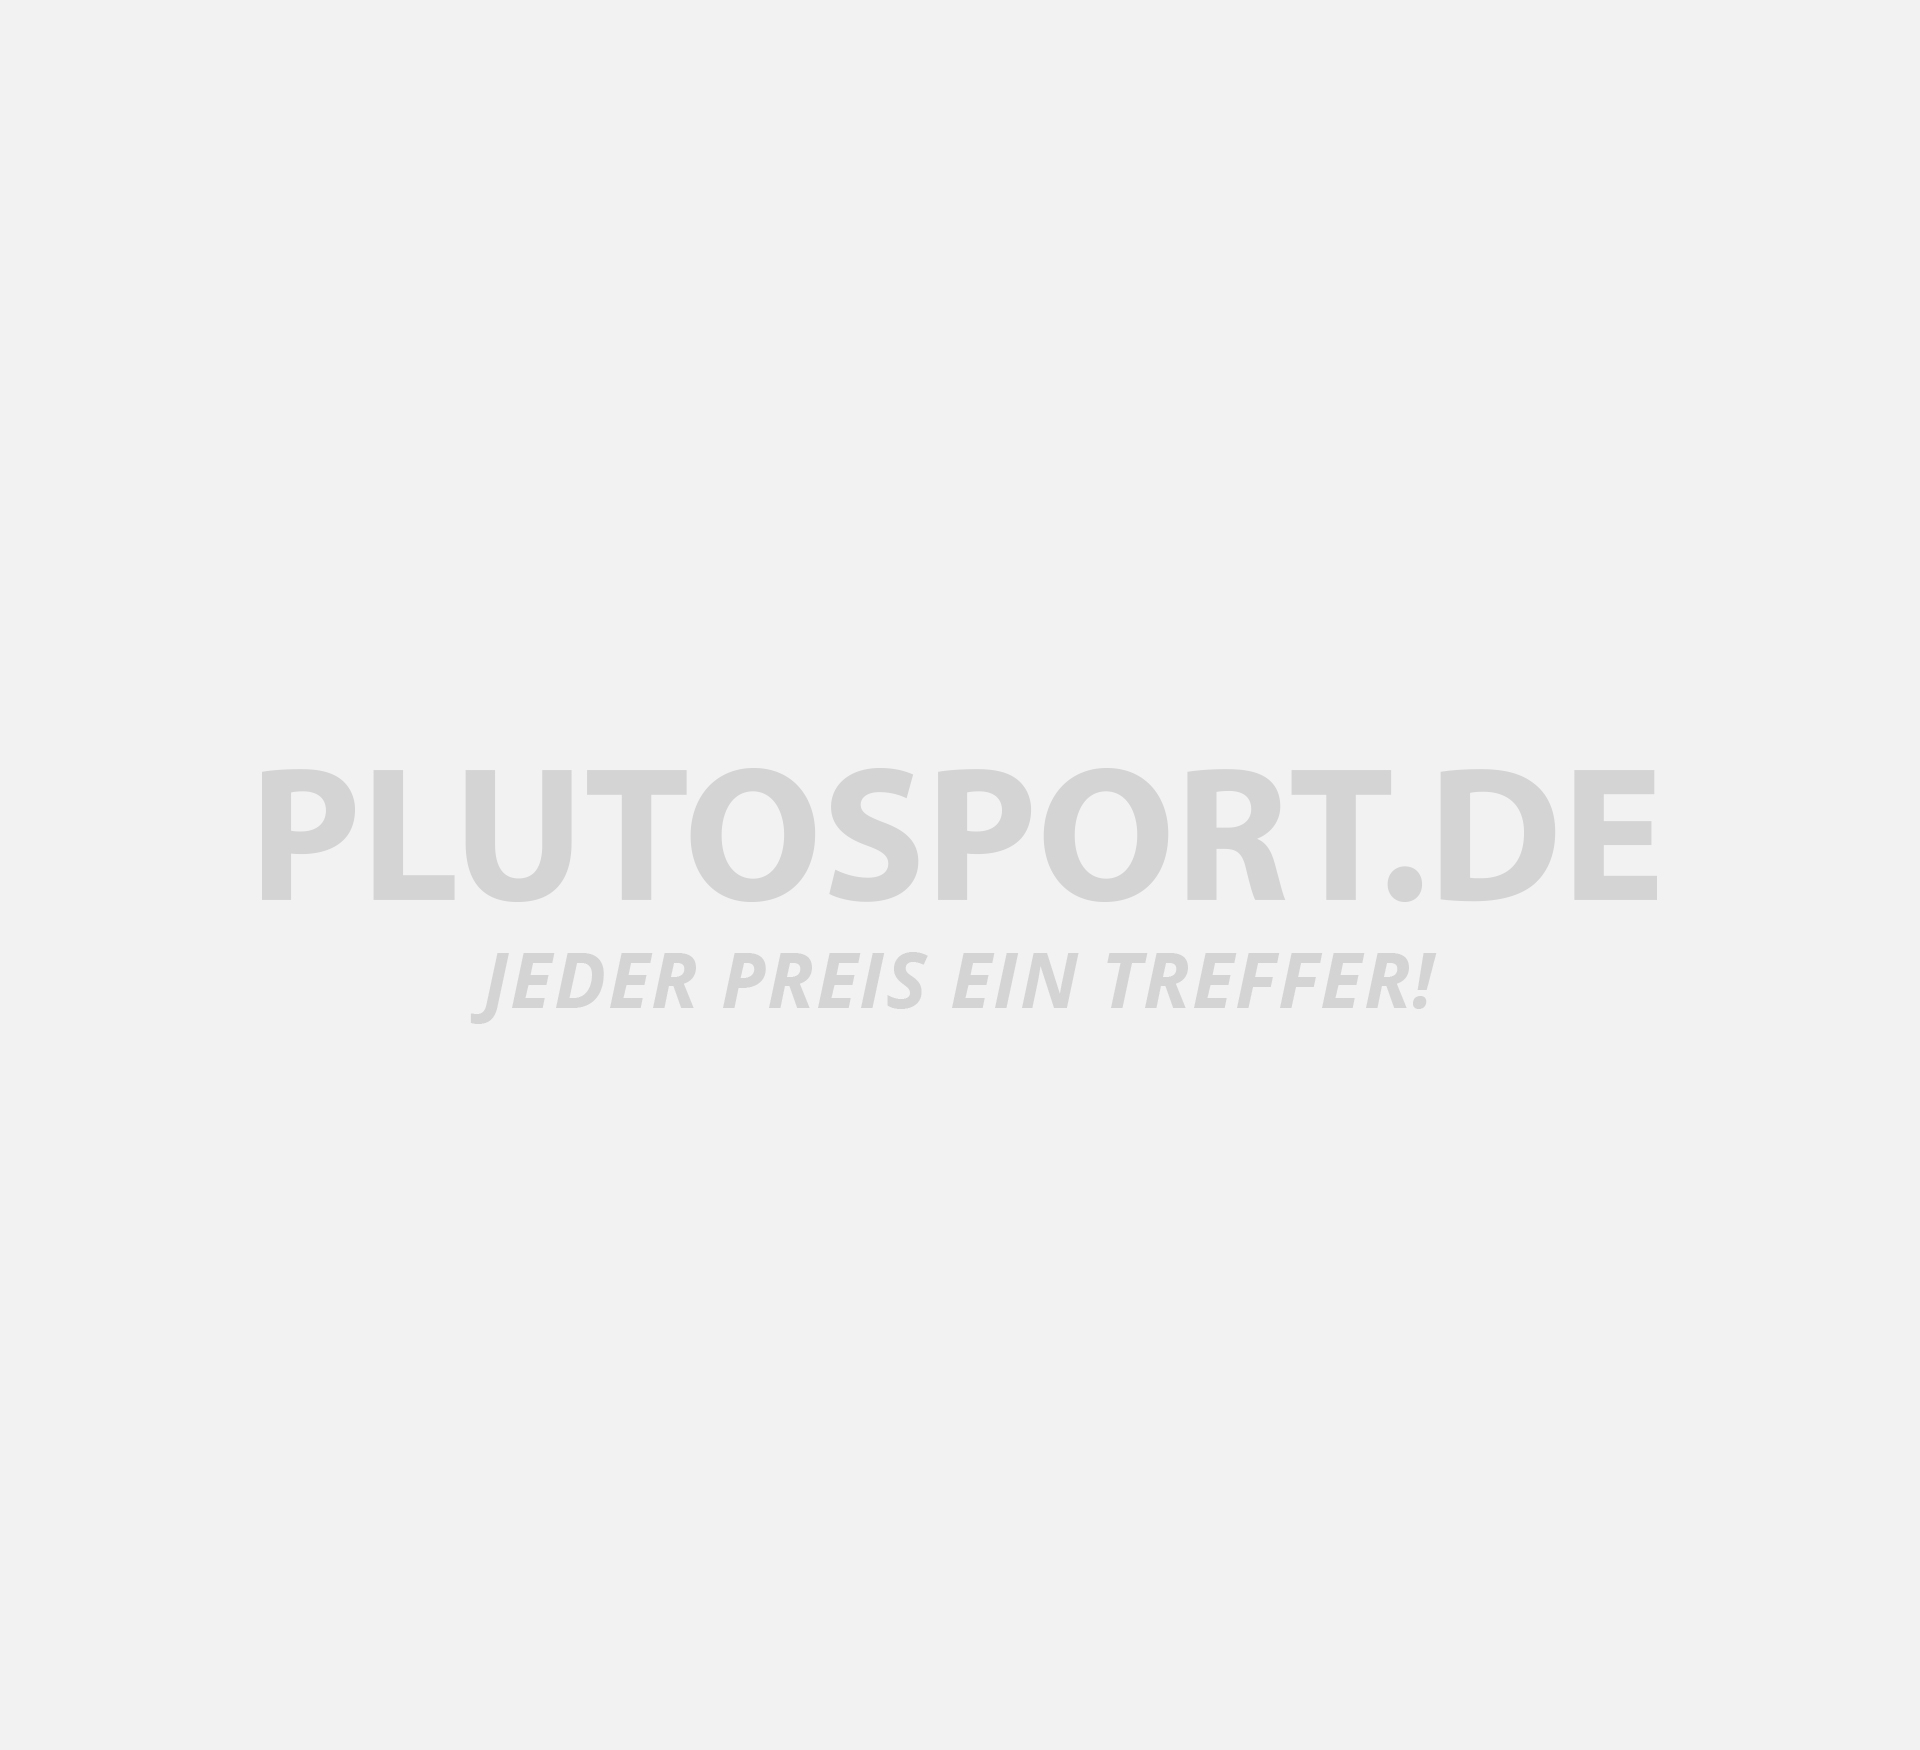 Adidas Beau Jeu Euro16 Sala 5x5 Match Ball Replica